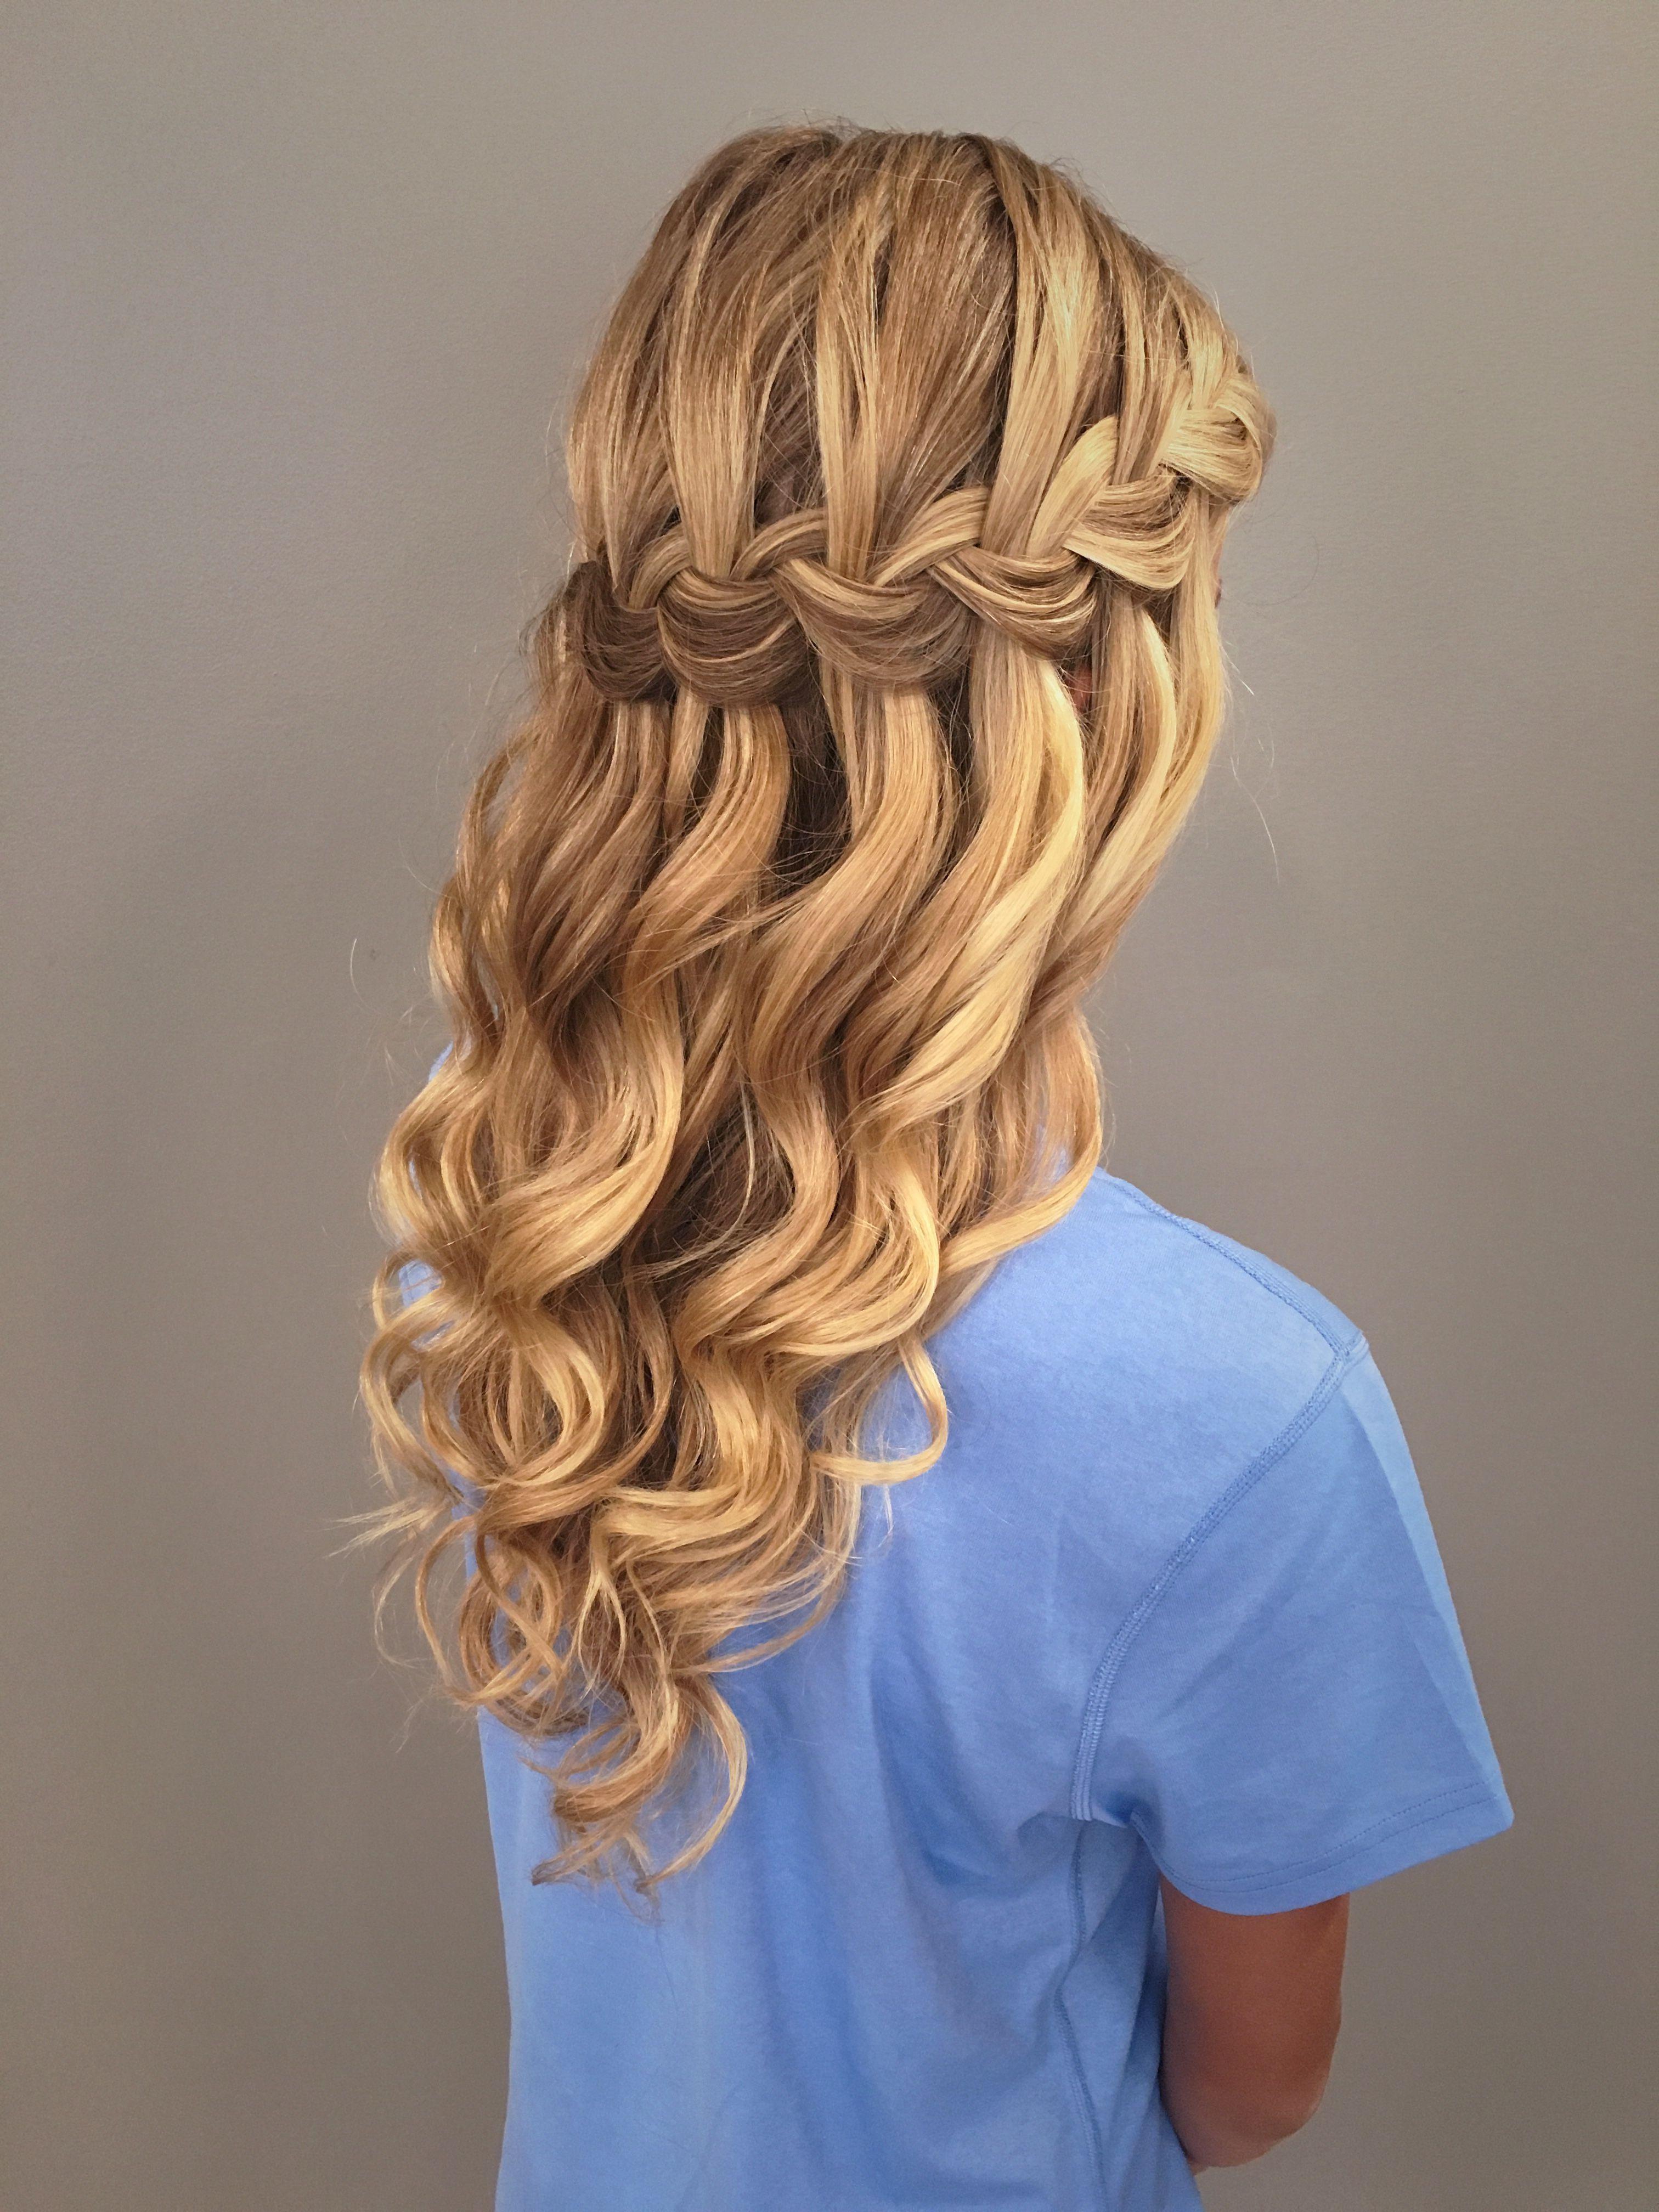 8th grade formal hairstyles for short hair | graduation hair